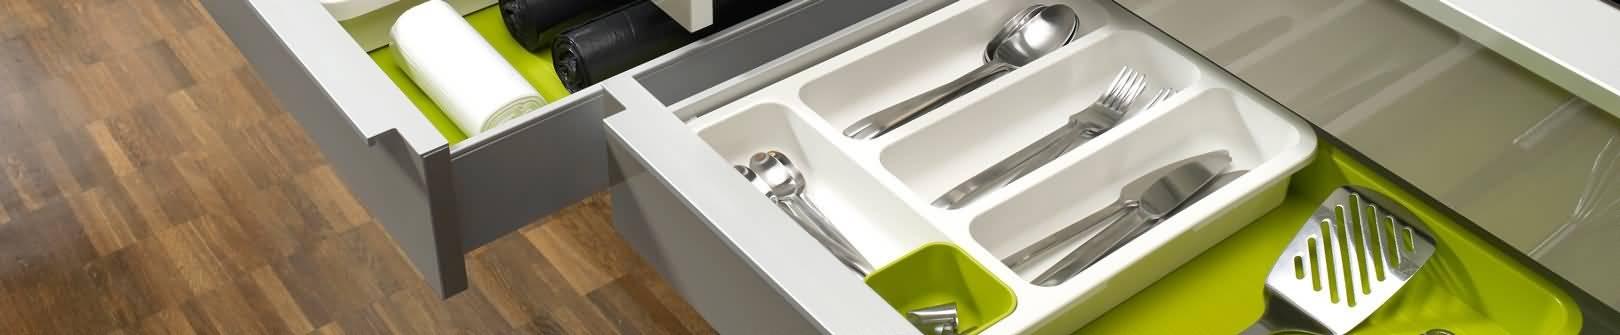 Cutlery Trays & Storage